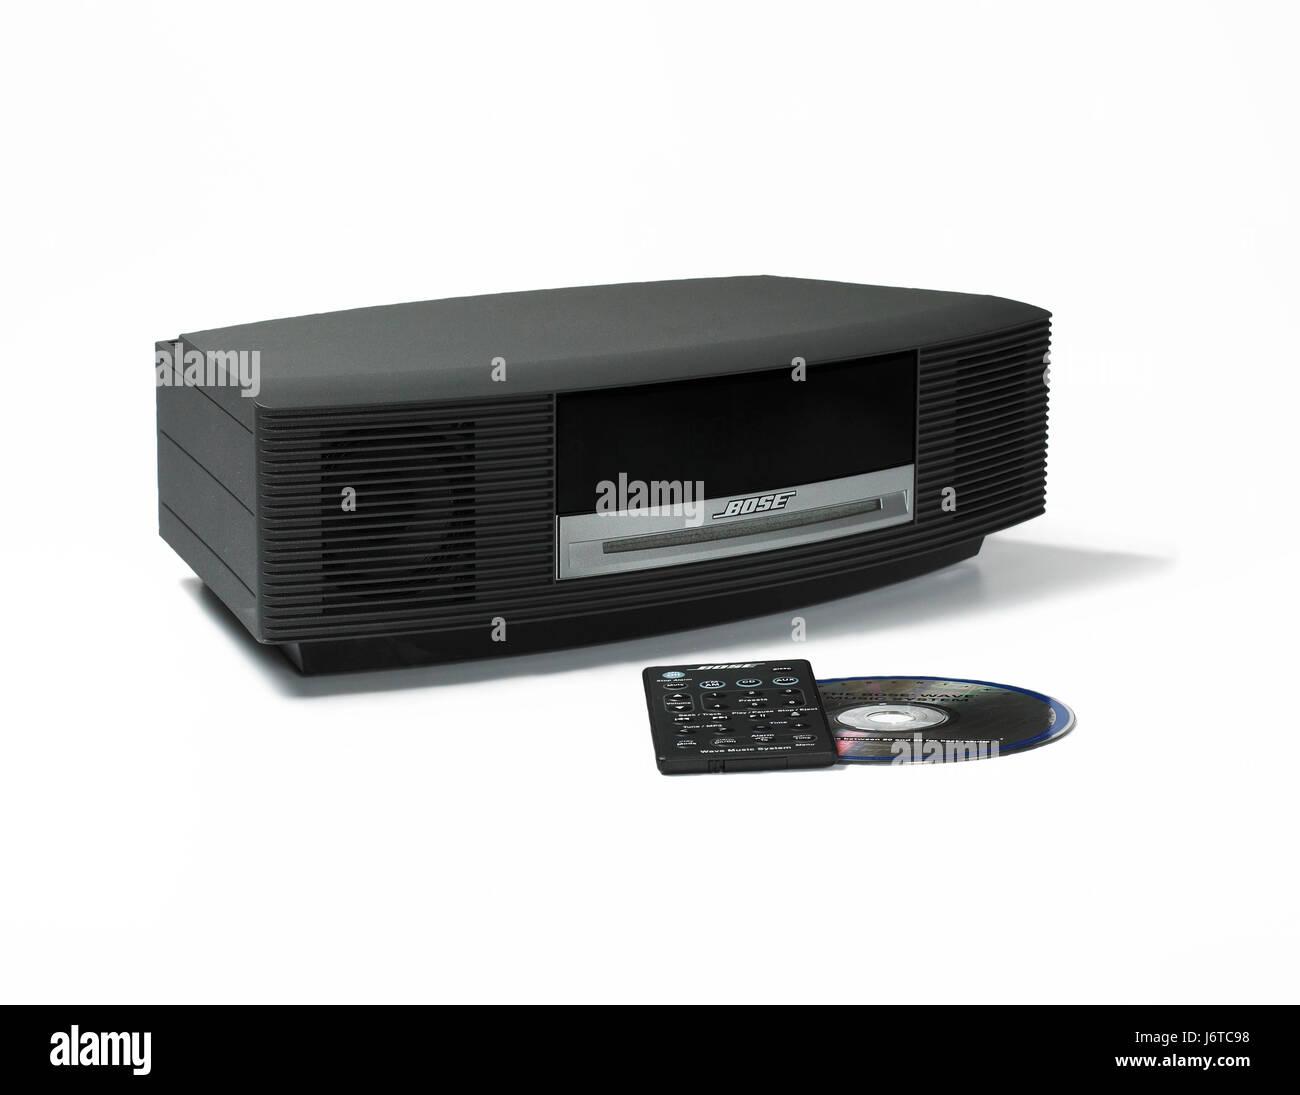 bose audio stockfotos bose audio bilder alamy. Black Bedroom Furniture Sets. Home Design Ideas